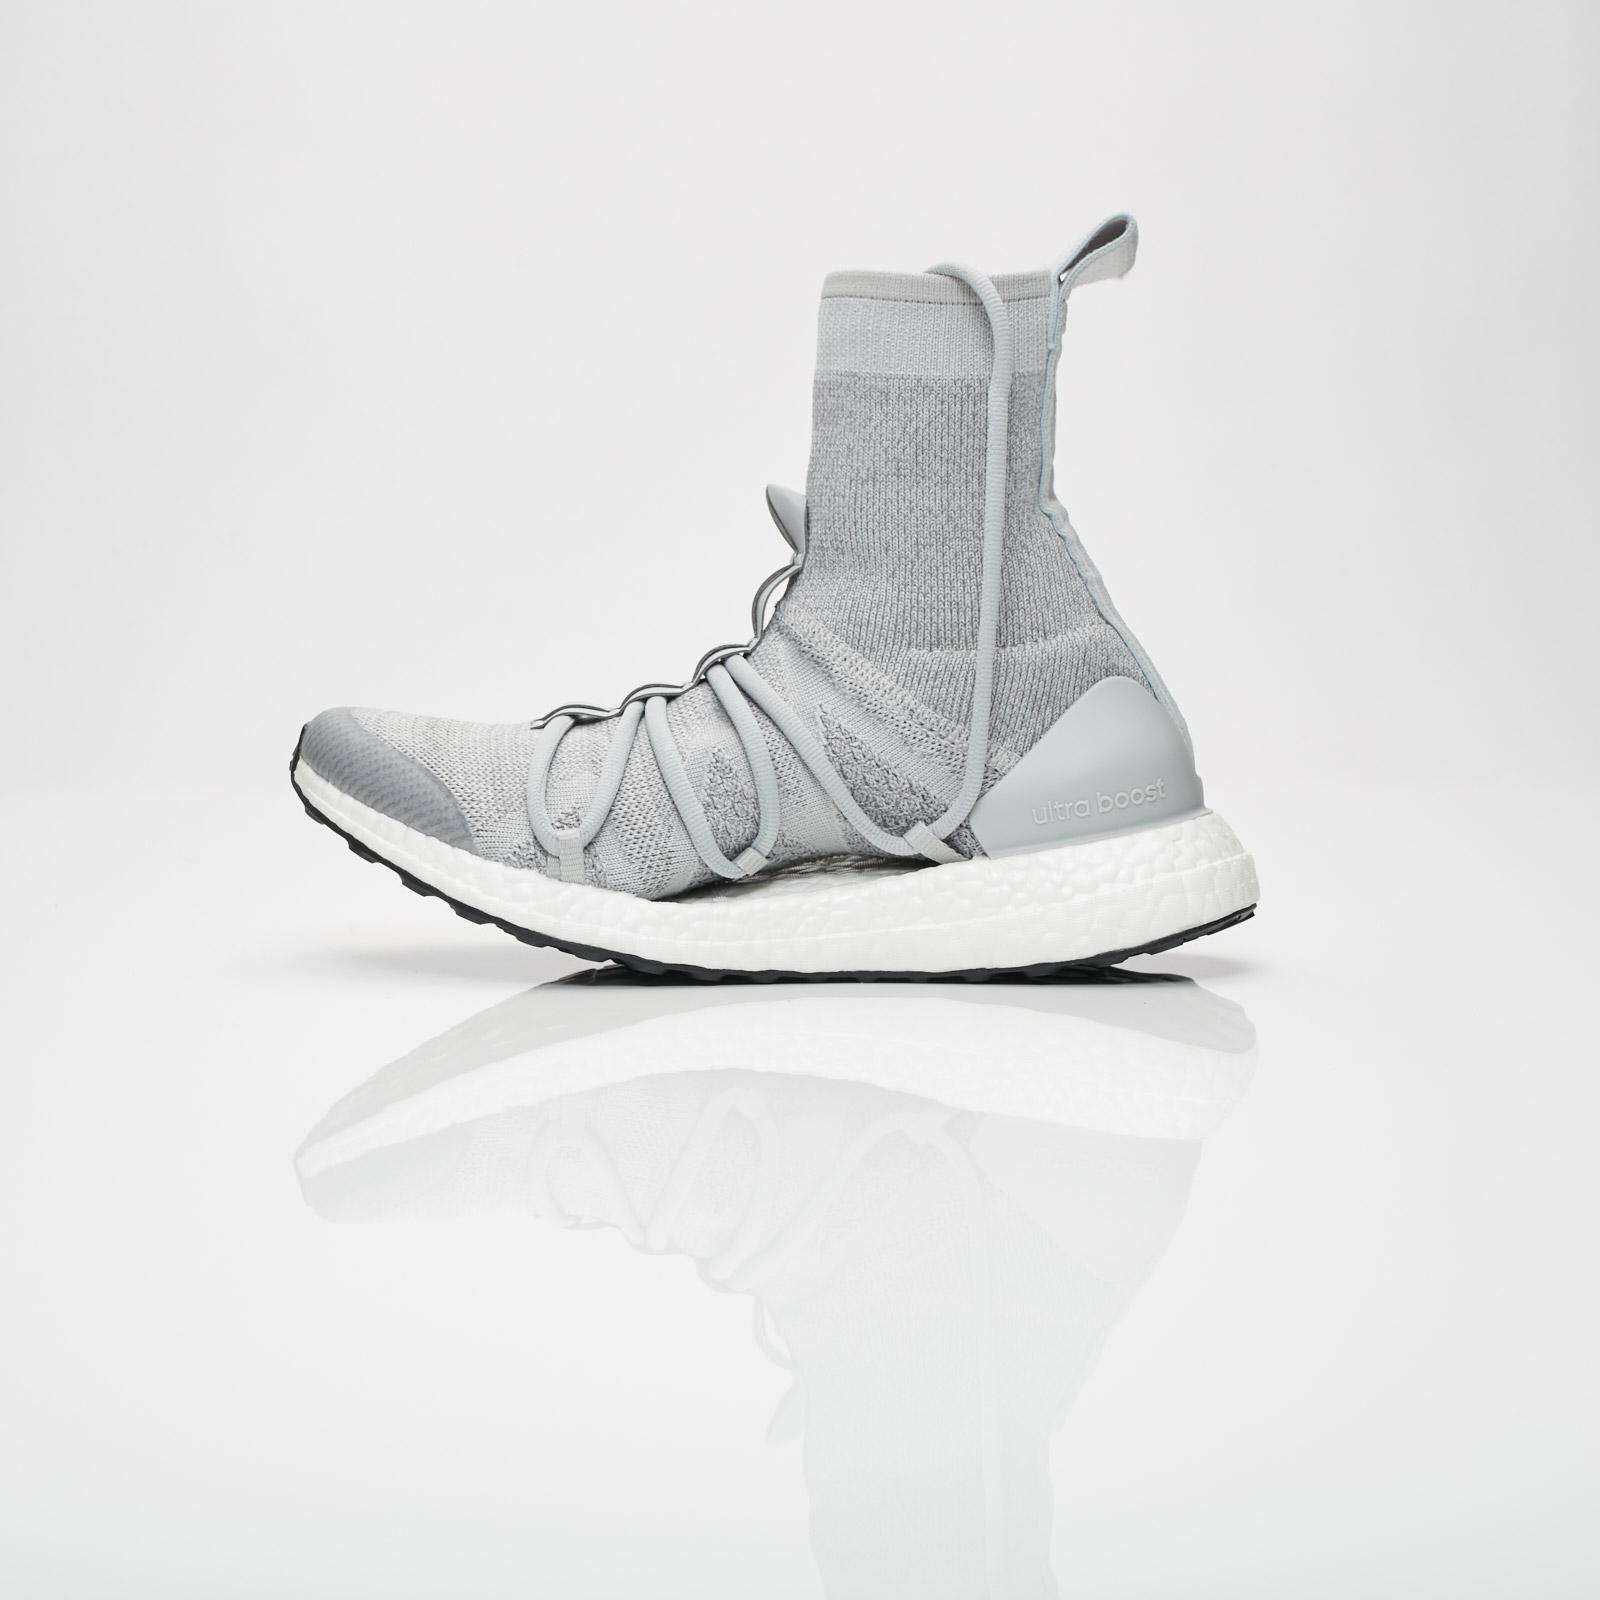 2523ba36d96c5 adidas UltraBOOST X Mid - Bb6269 - Sneakersnstuff